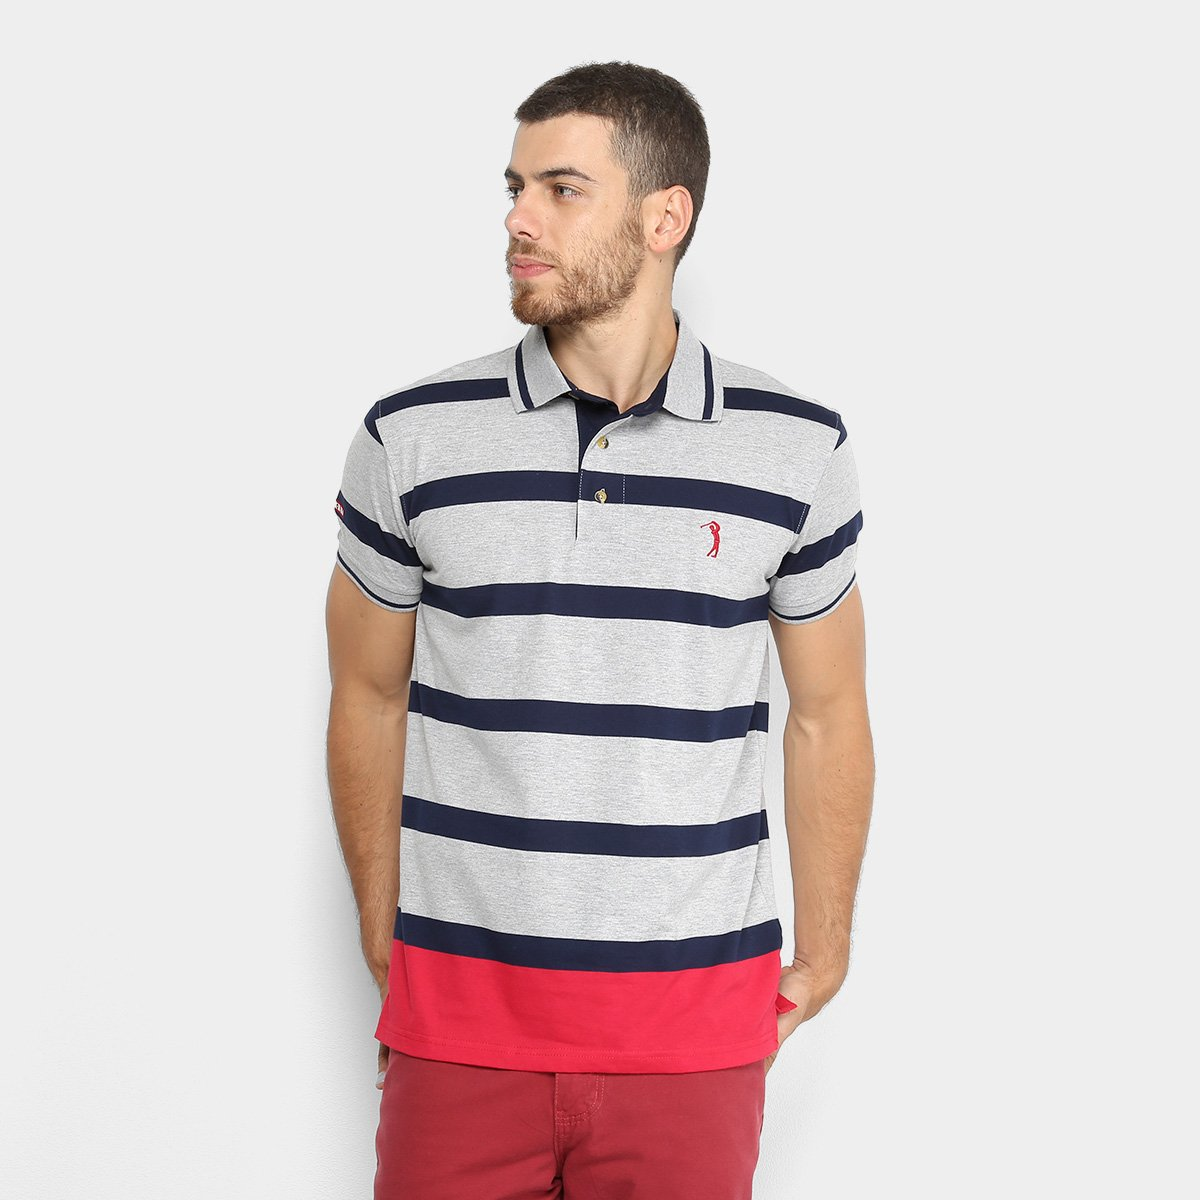 b5477f5619 Camisa Polo Aleatory Fio Tinto Listrada Masculina